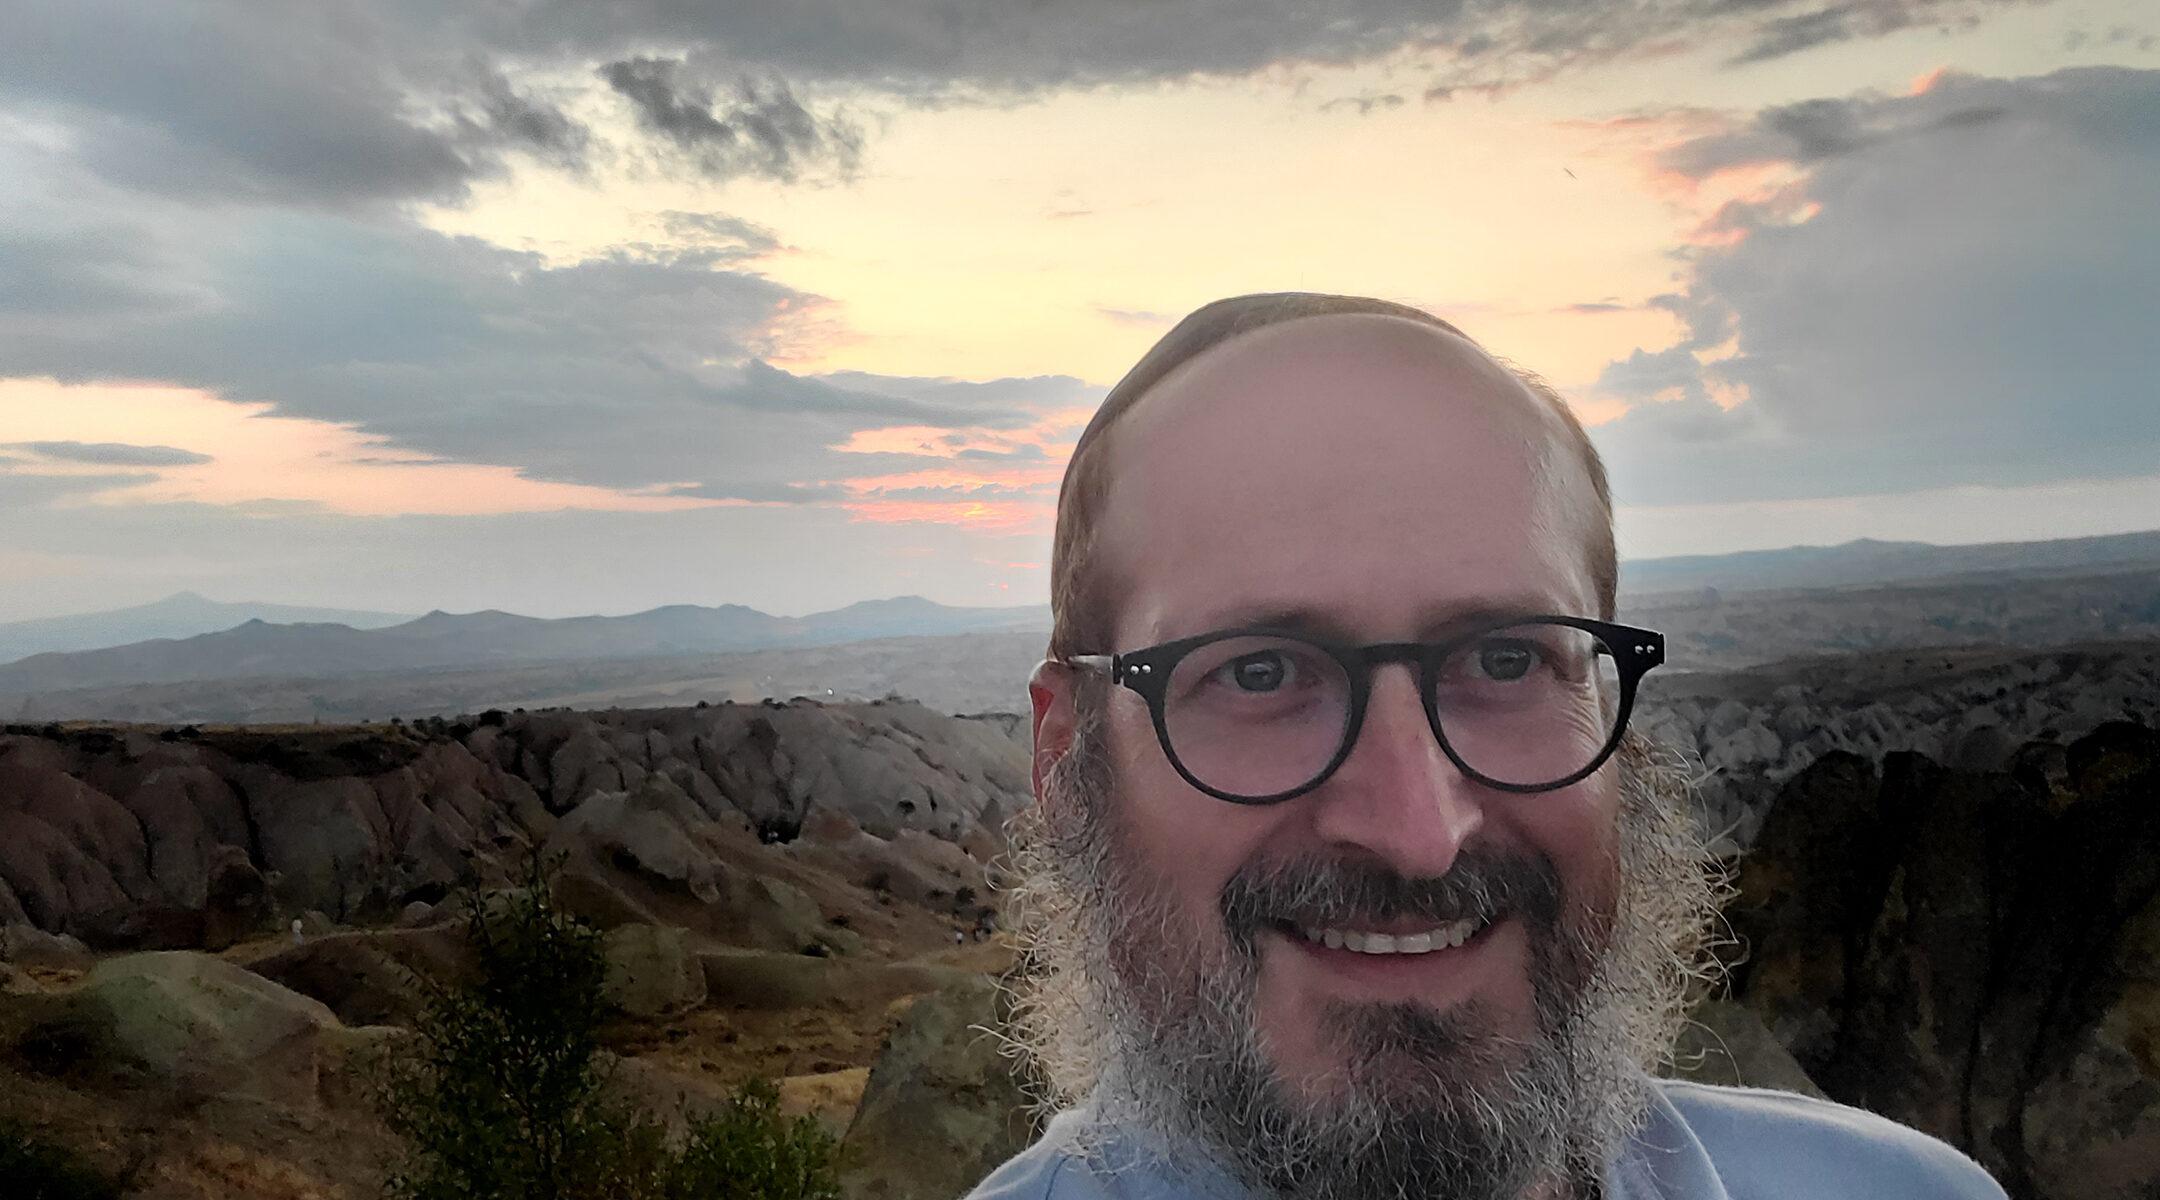 Rabbi Mendy Chitrik takes a selfie at sunset in Turkey on Aug. 9, 2021. (Courtesy of Chitrik)